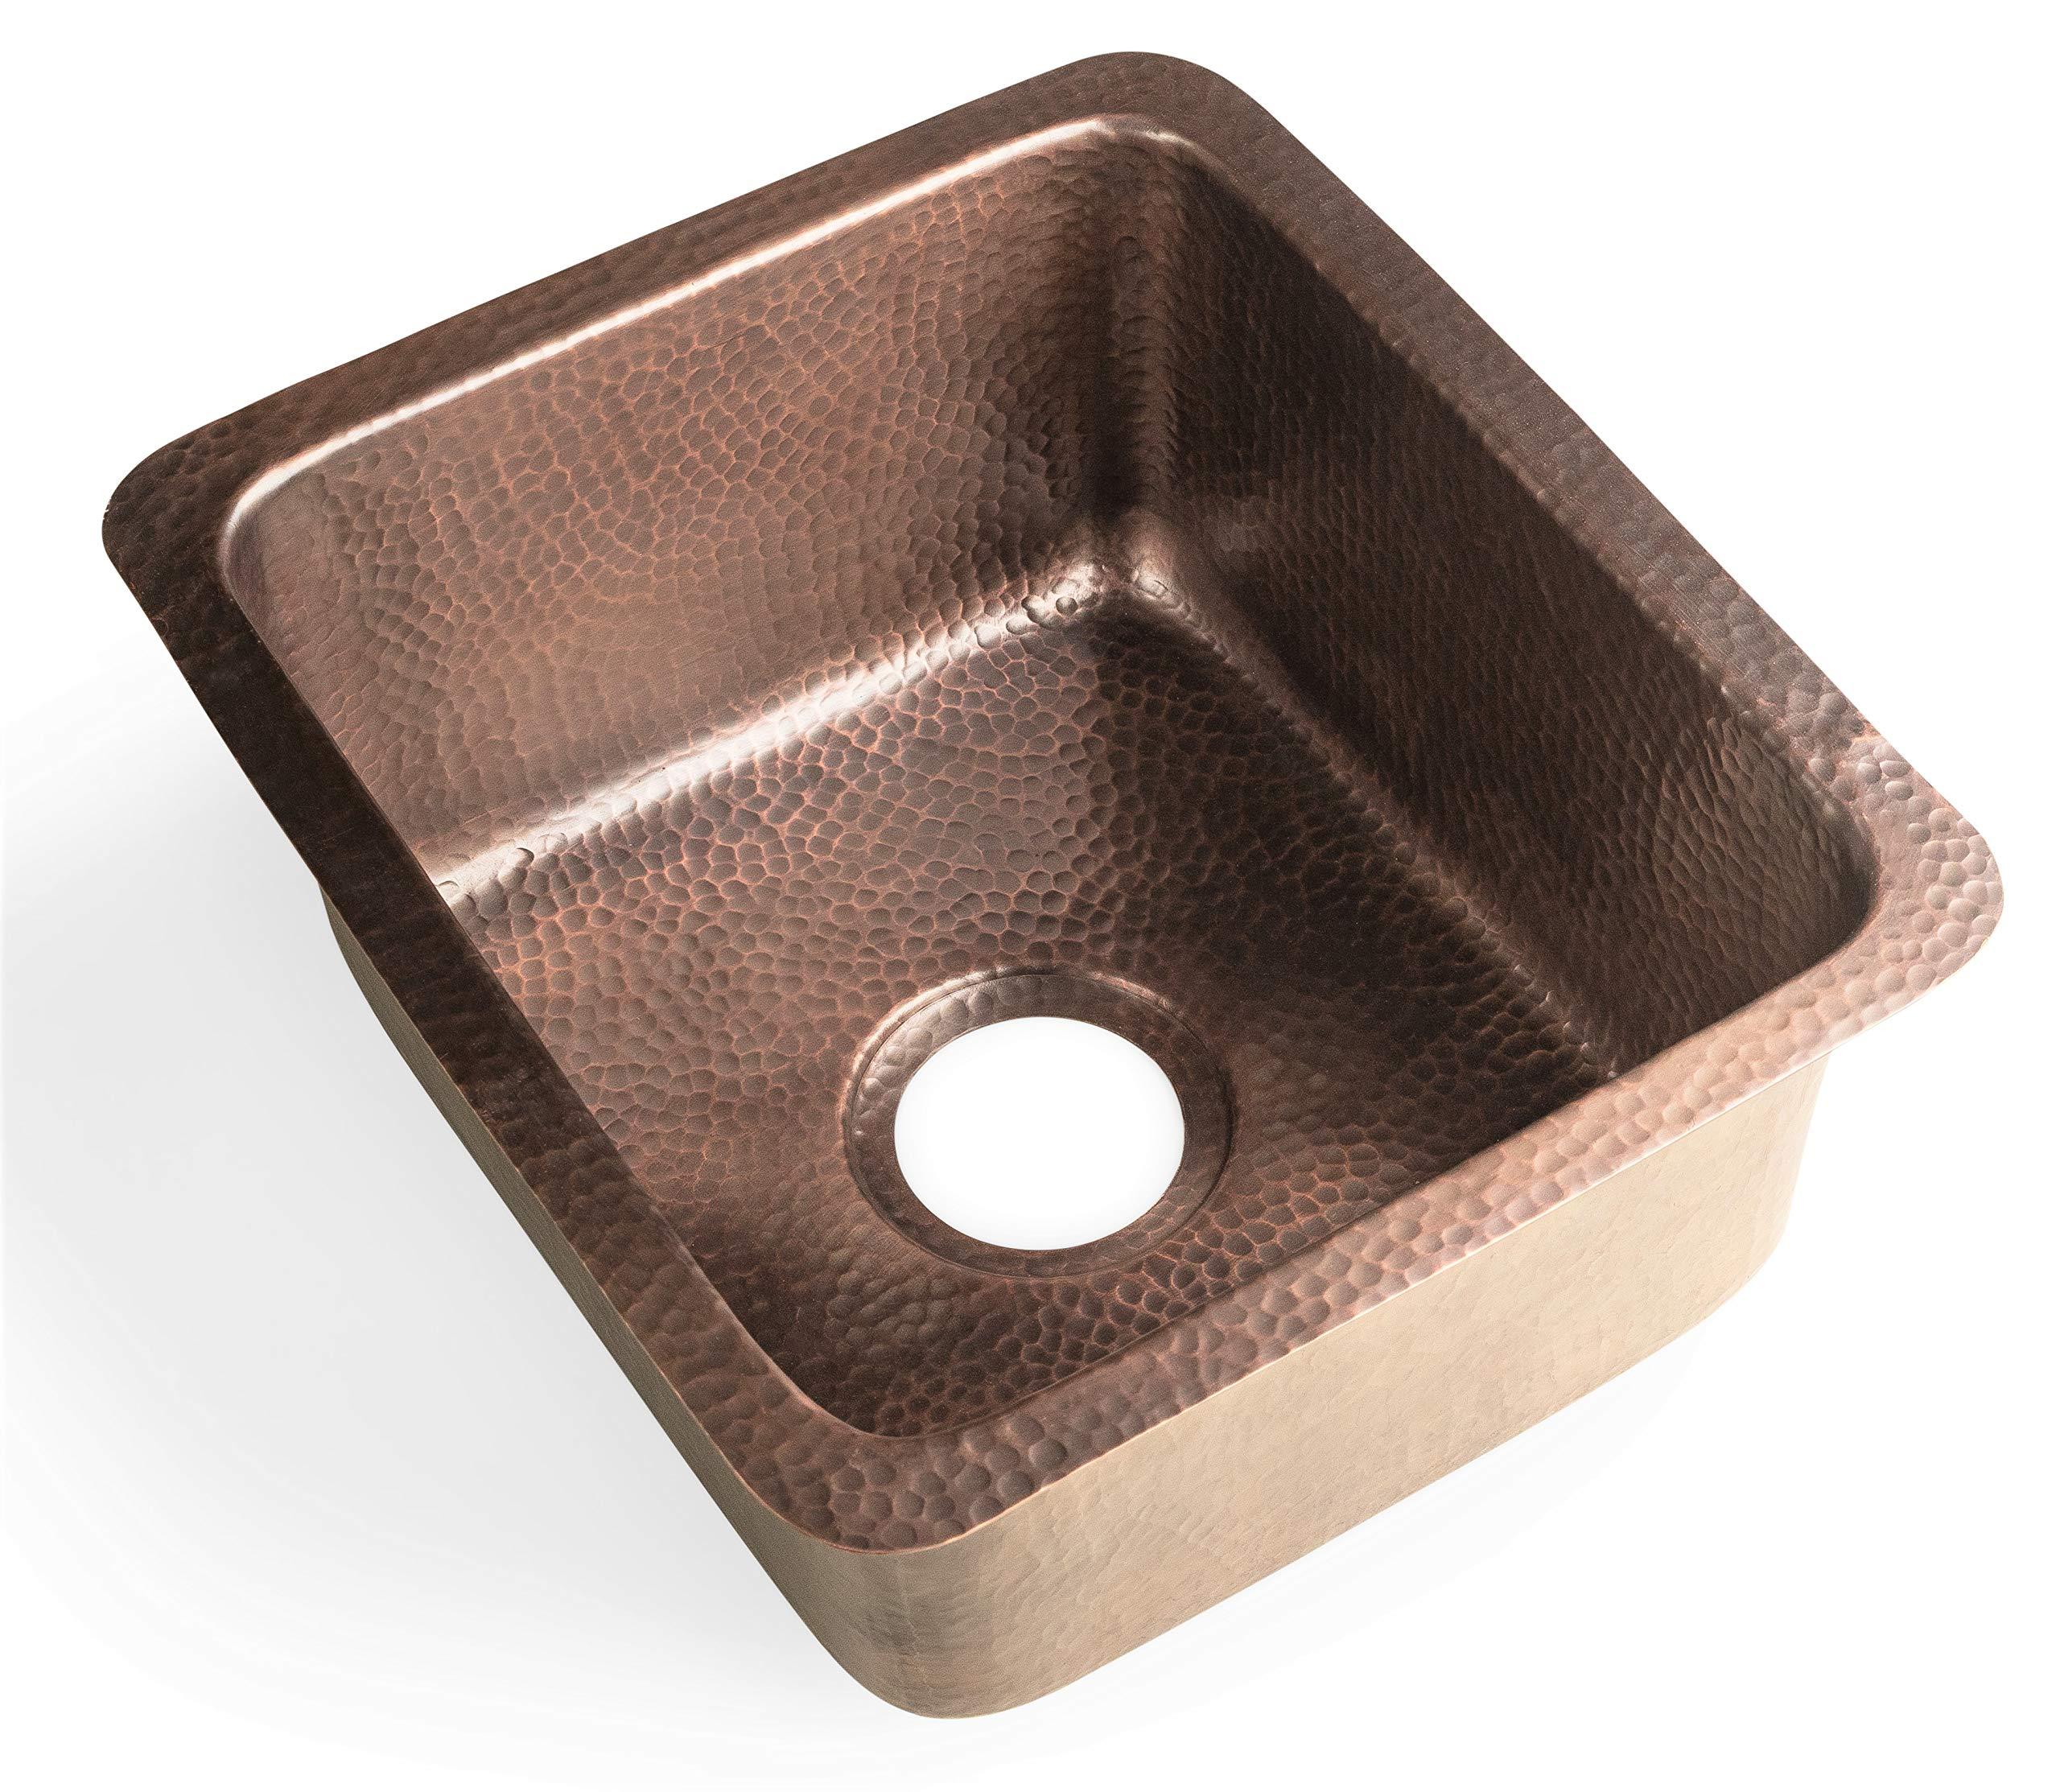 Monarch Abode 17090 Pure Copper Hand Hammered Highball Bar Prep/Kitchen Sink (17 inches) by Monarch Abode